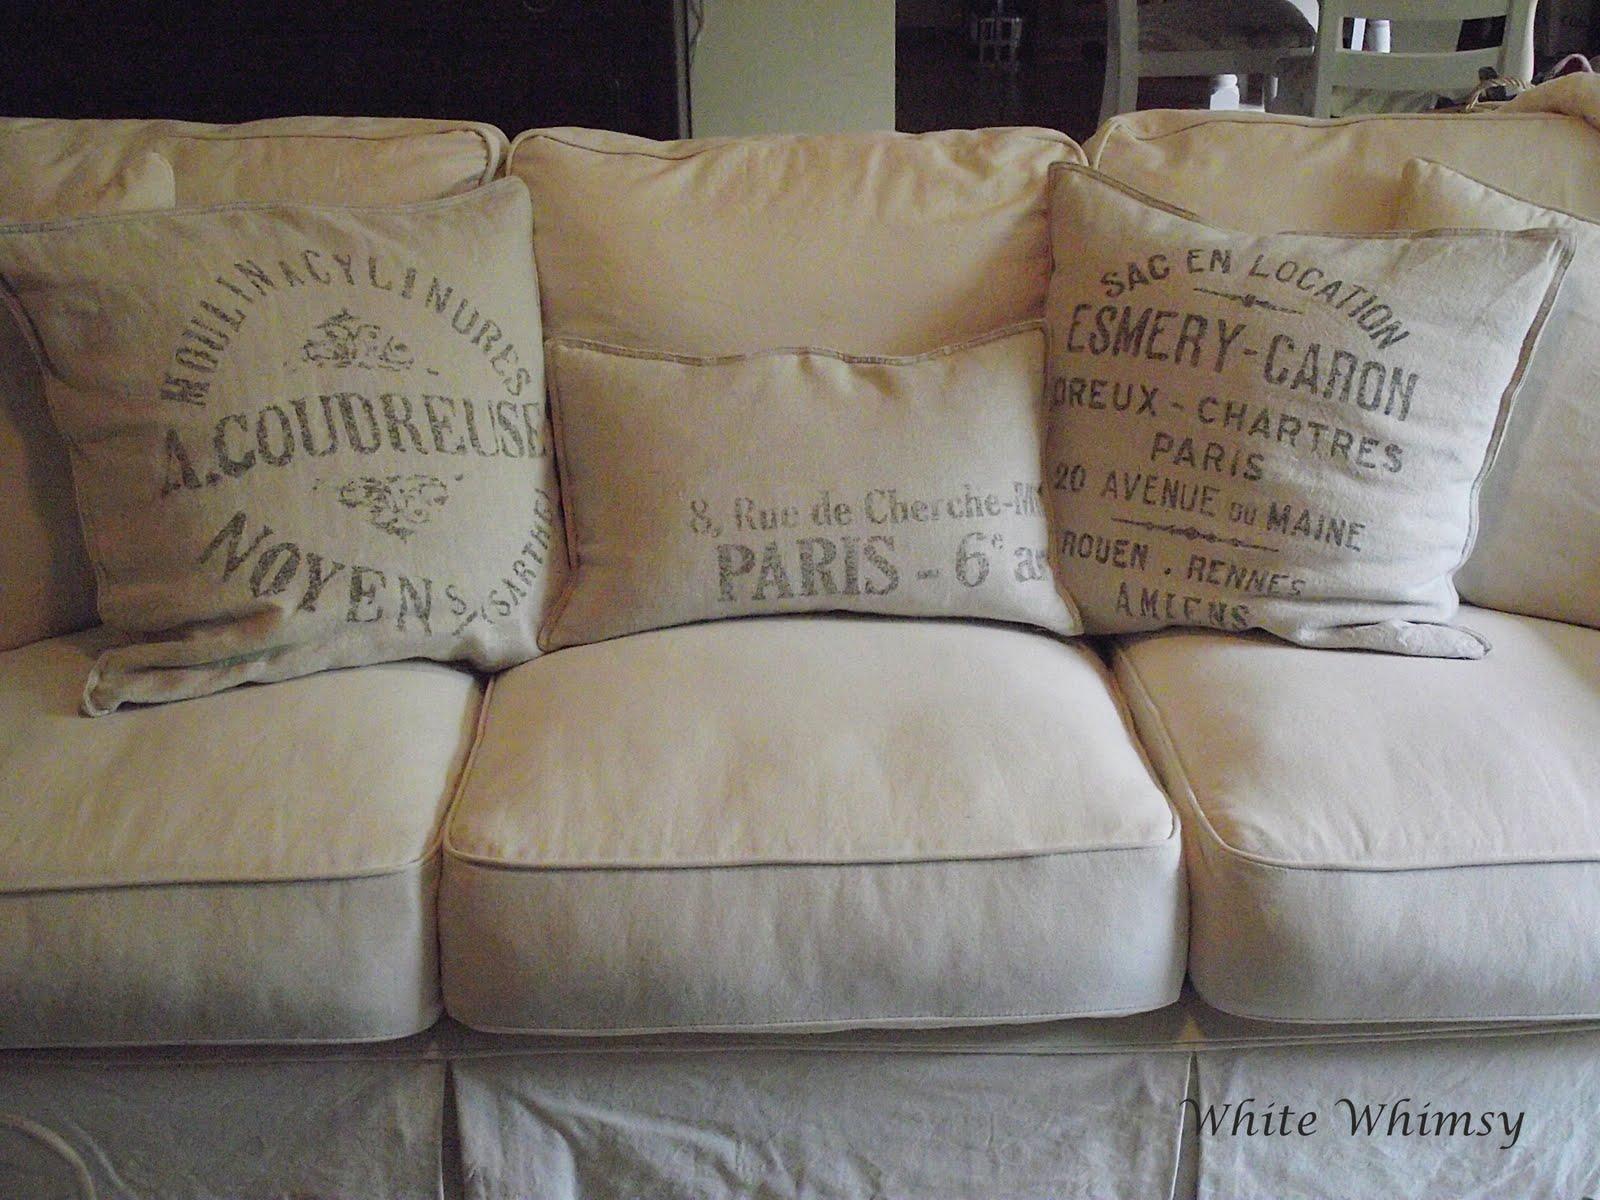 restoration hardware beanbag chair convert to stool white whimsy coffee bean sacks